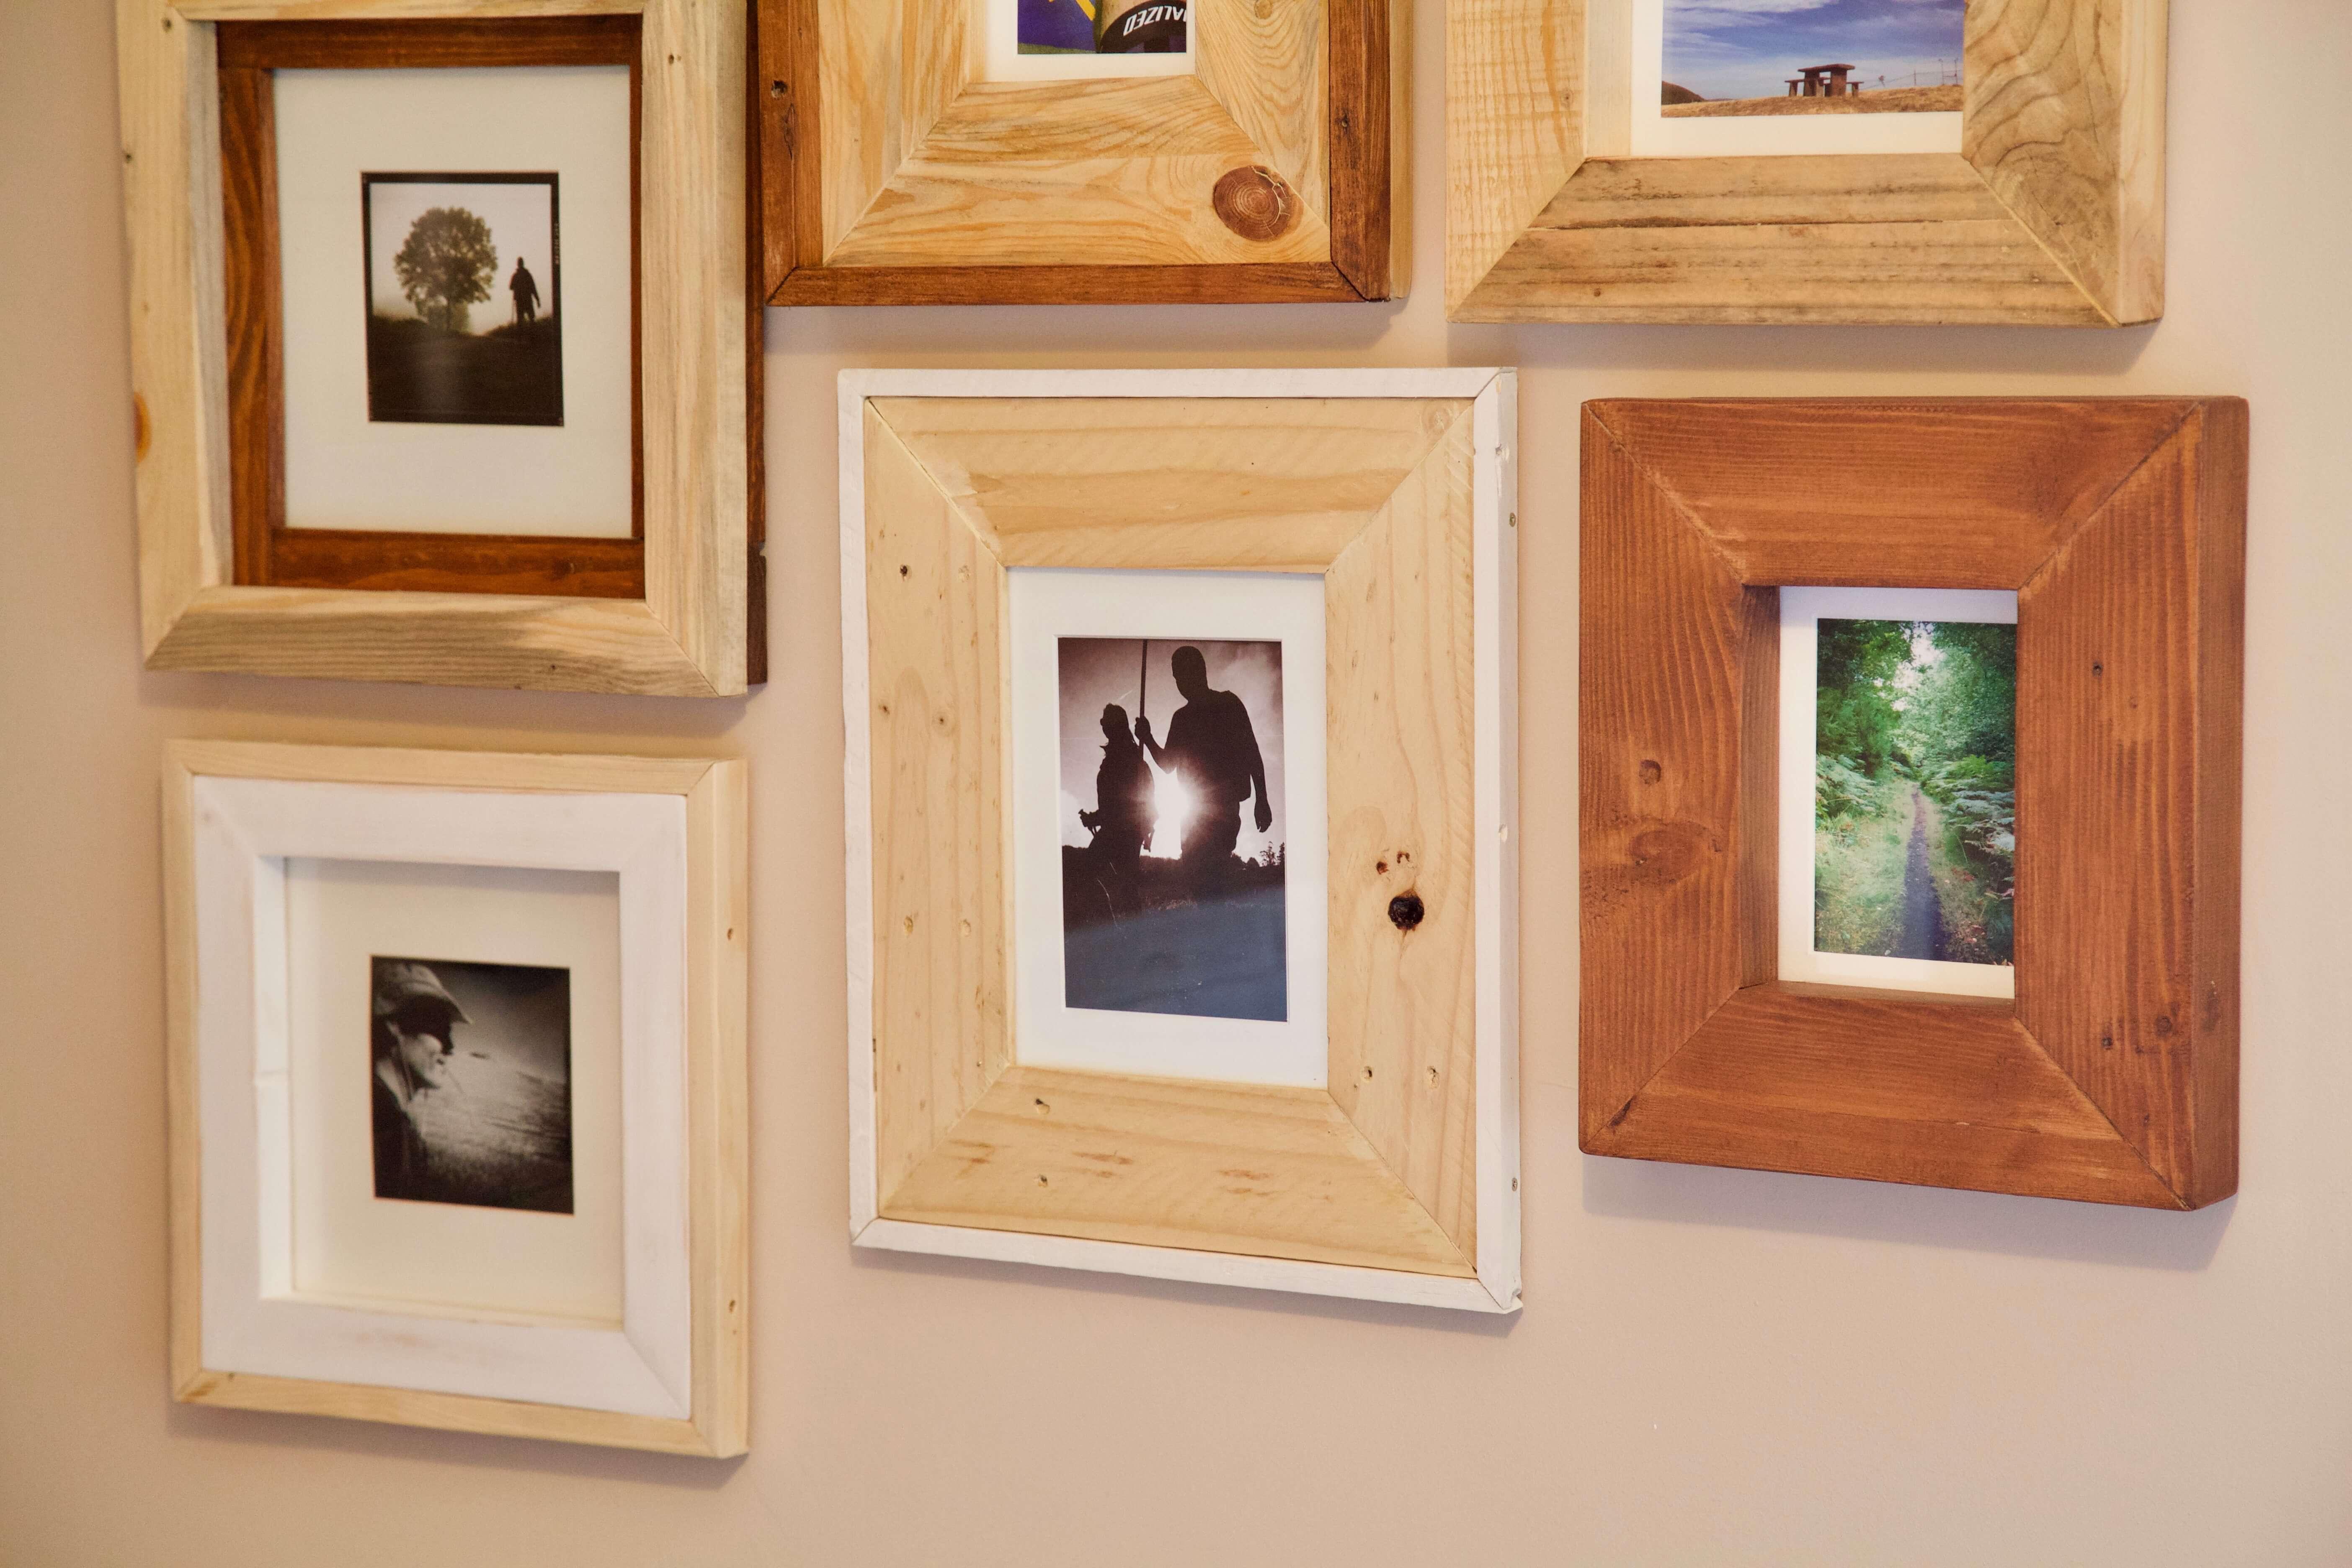 Marcos para fotos de palets groucho paletos - Diy marcos para fotos ...